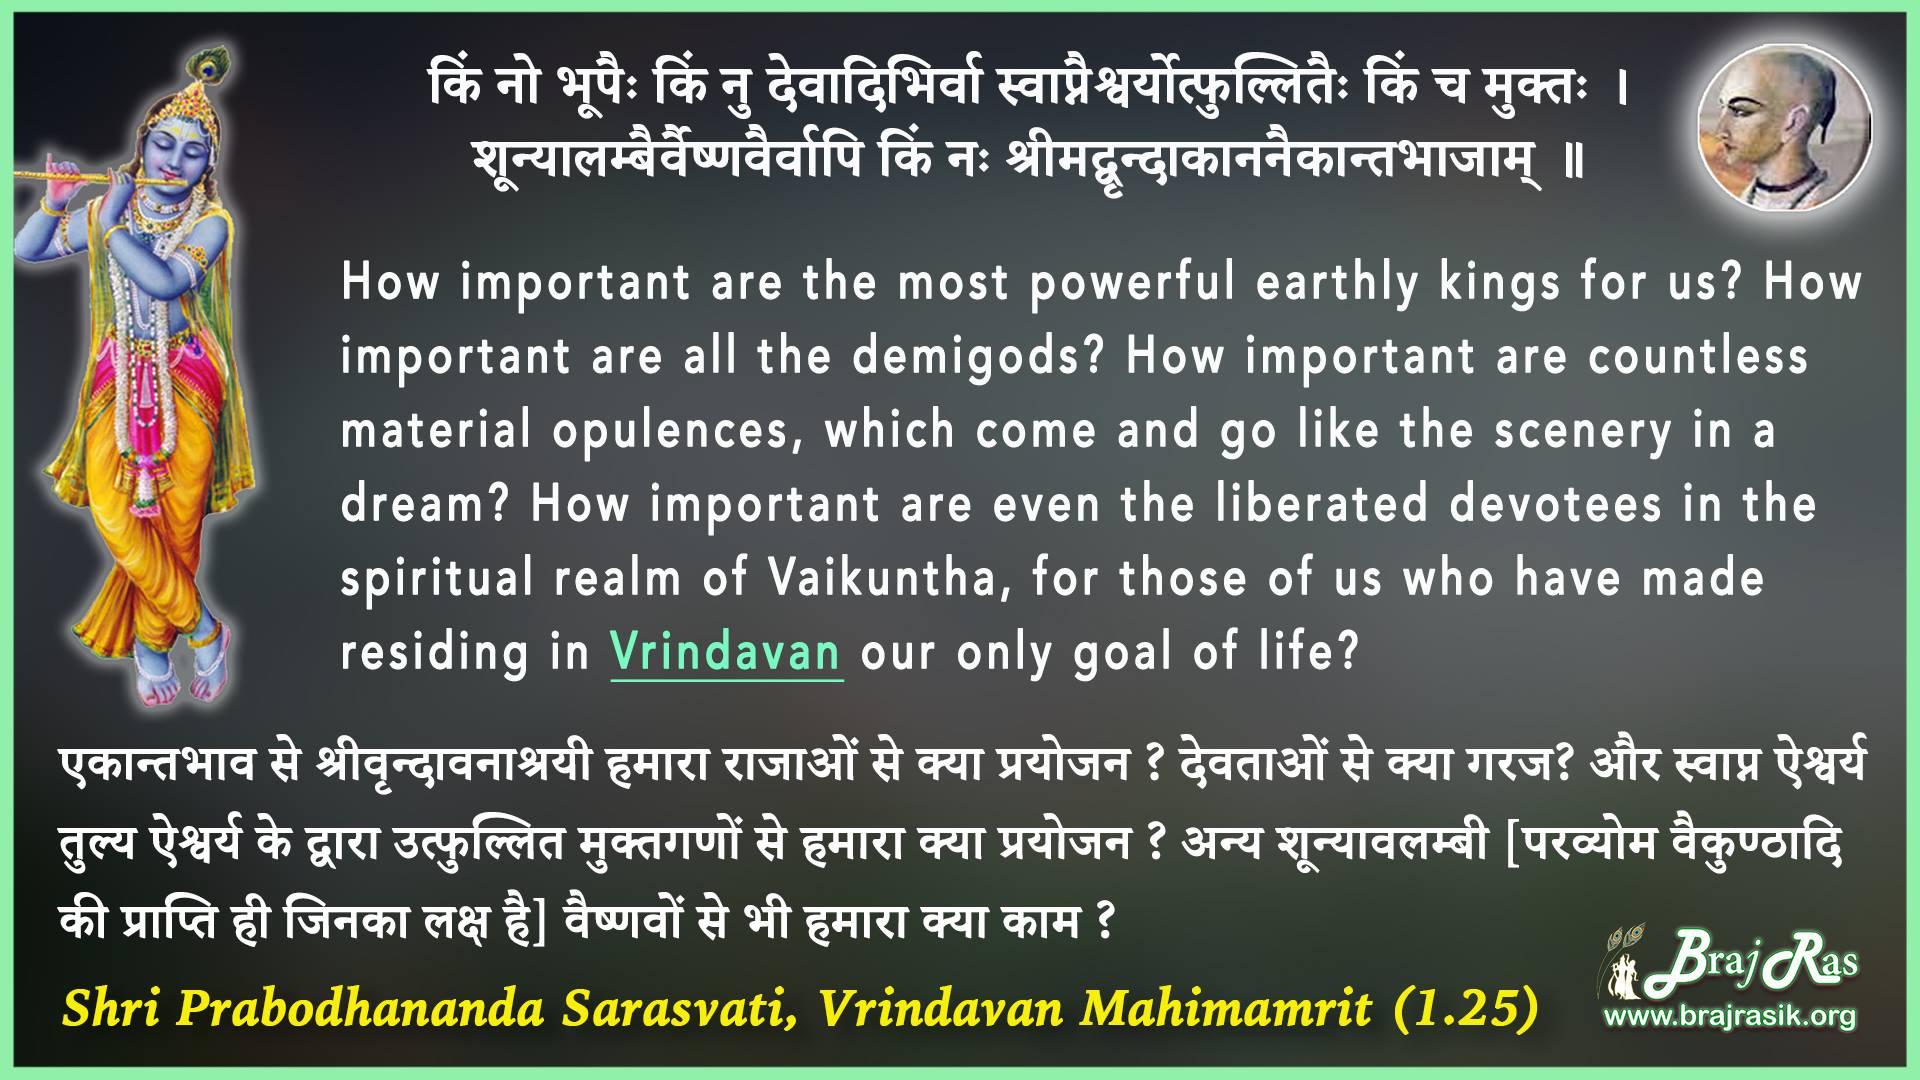 Kim No Bhupe Kim Nu Devacdibhirva - Shri Prabodhananda Sarasvati, Vrindavan Mahimamrit (1.25)